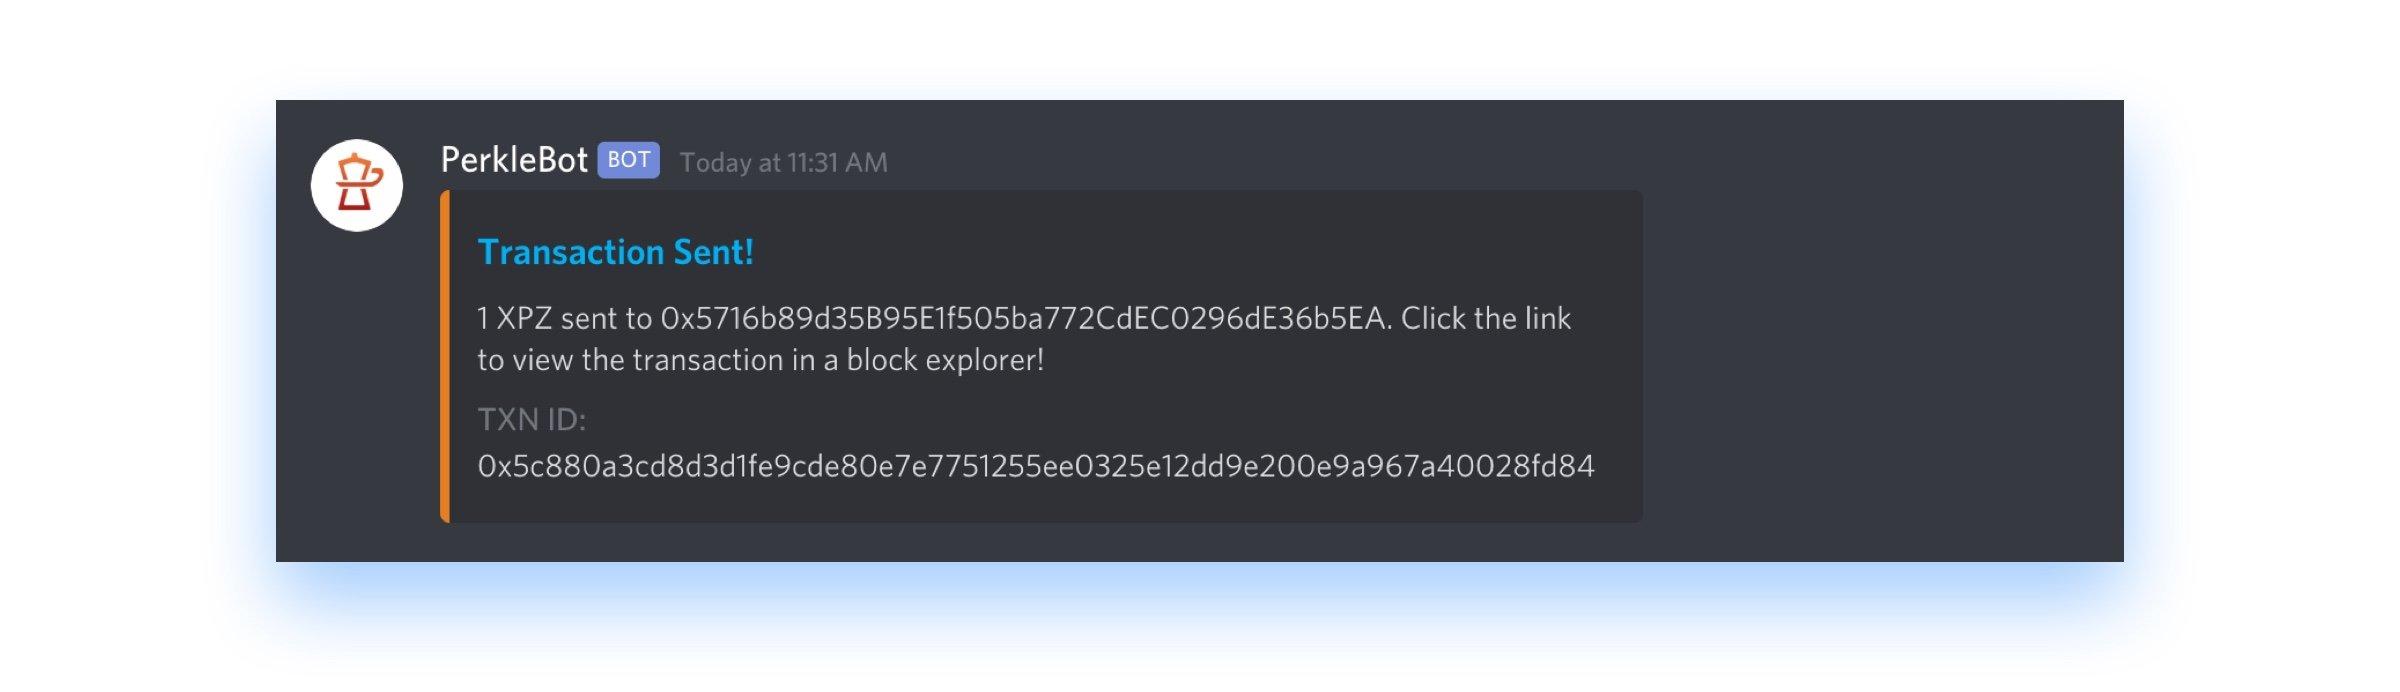 Esprezzo Discord PerkleBot transaction confirmation message